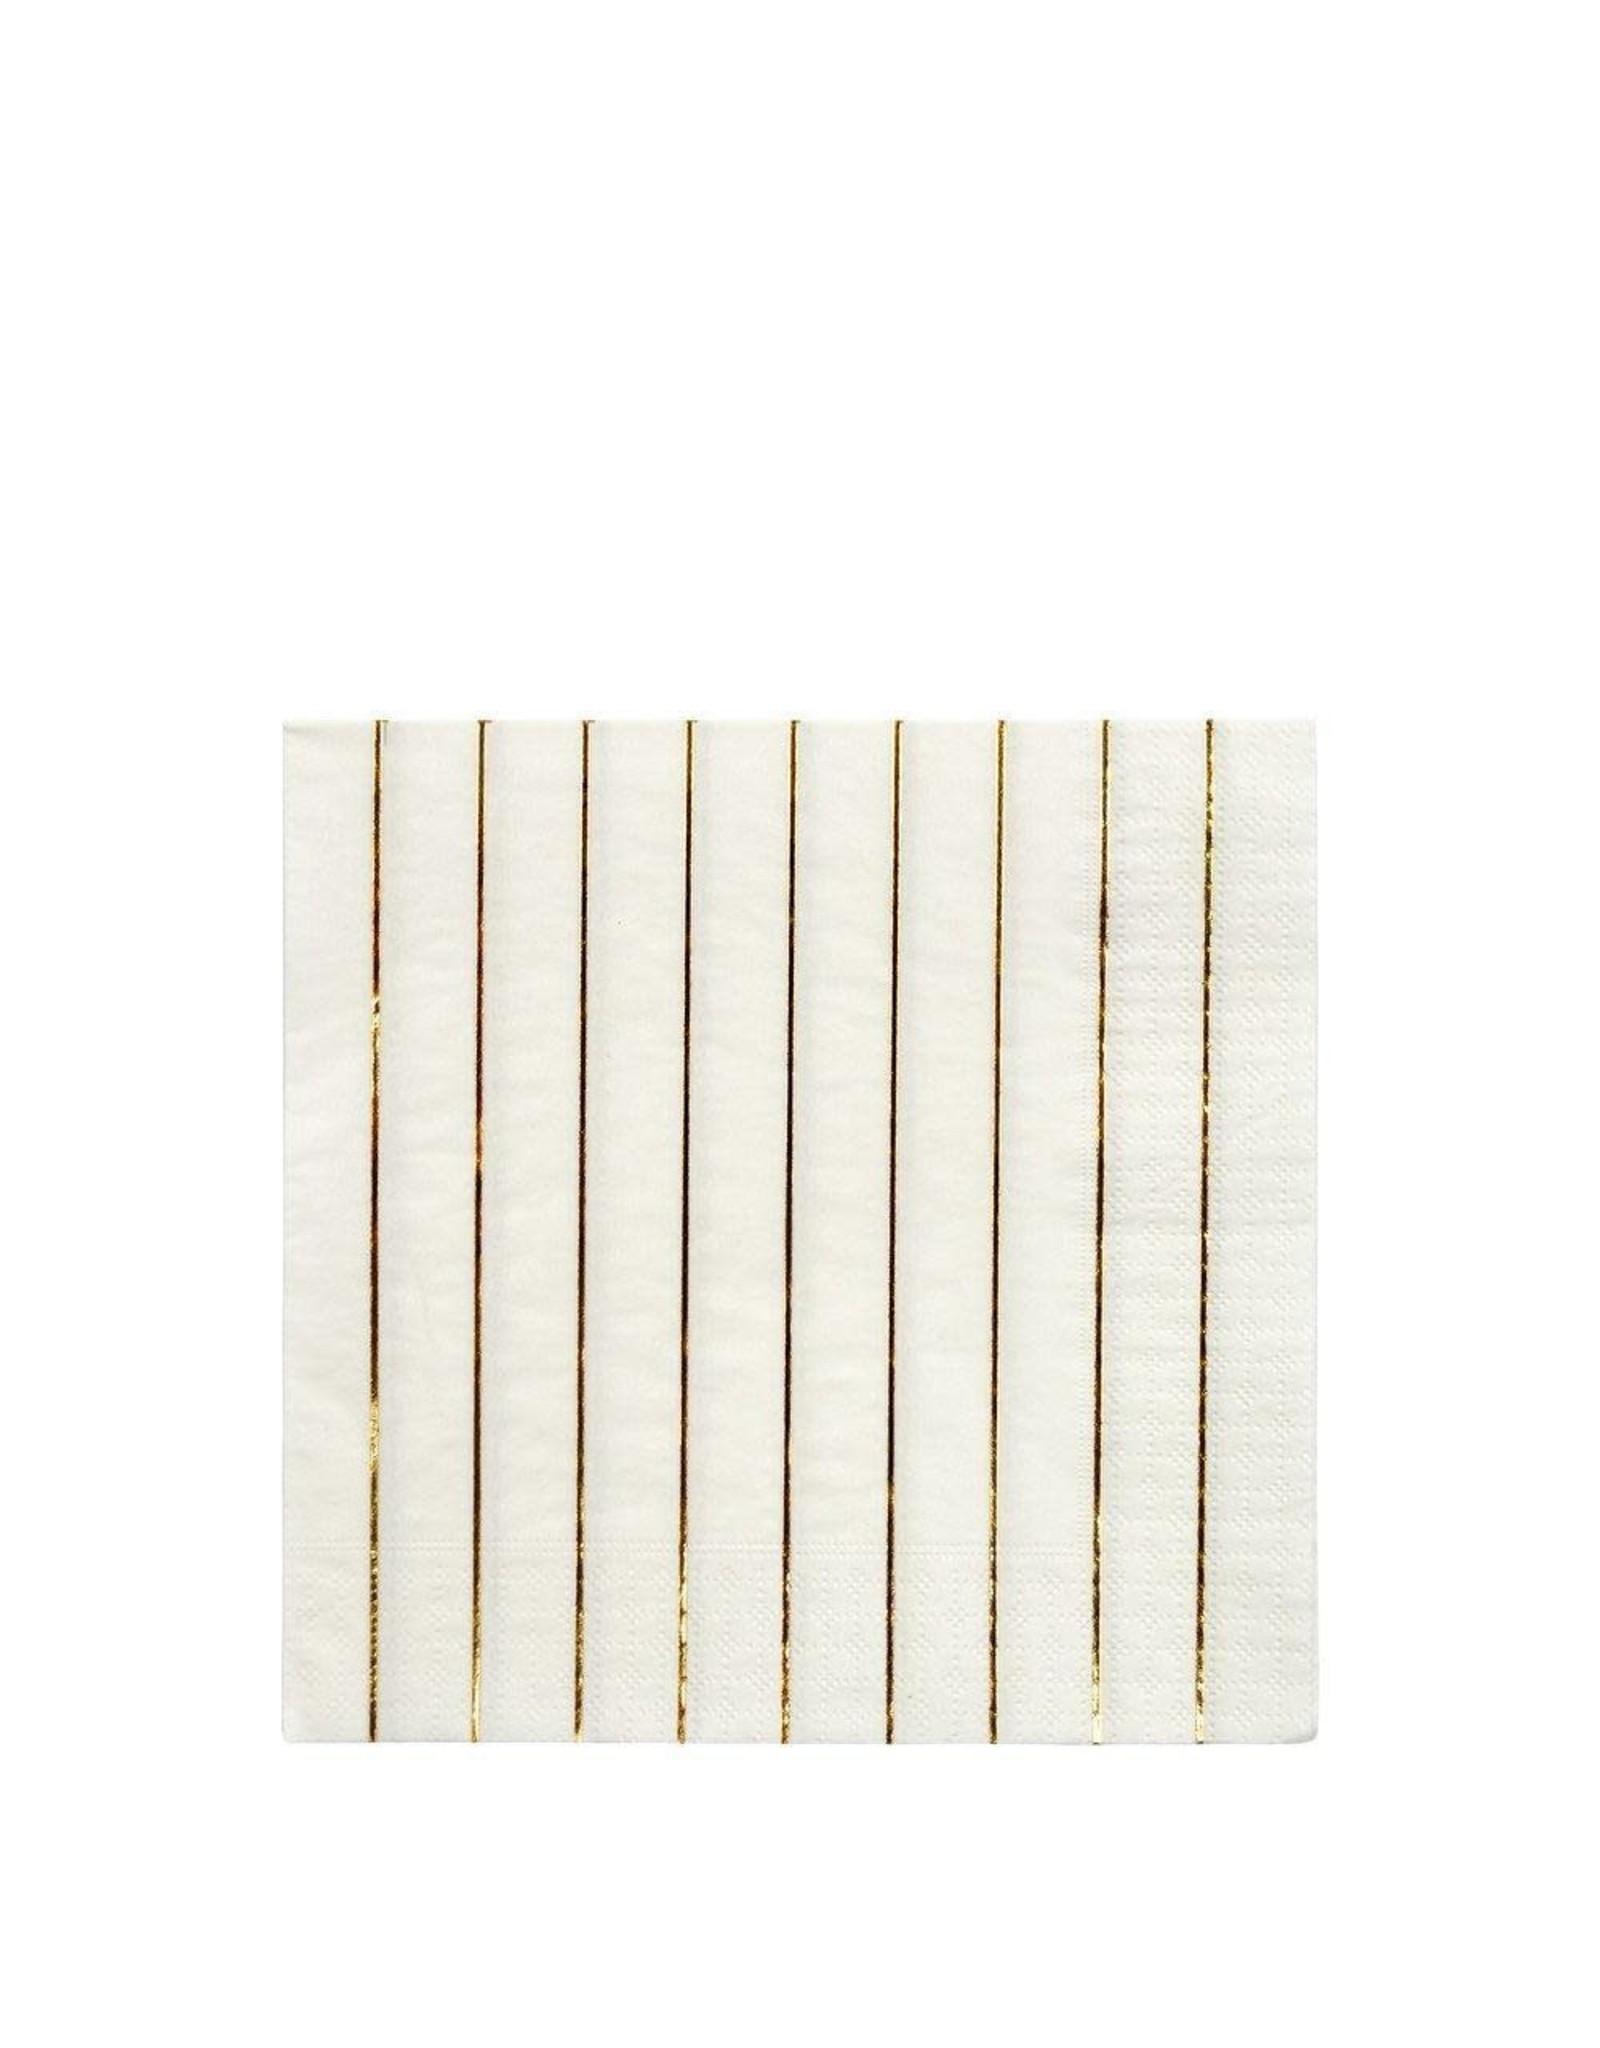 Meri Meri Serviettes | Gouden strepen | 16st | 13 x 13cm